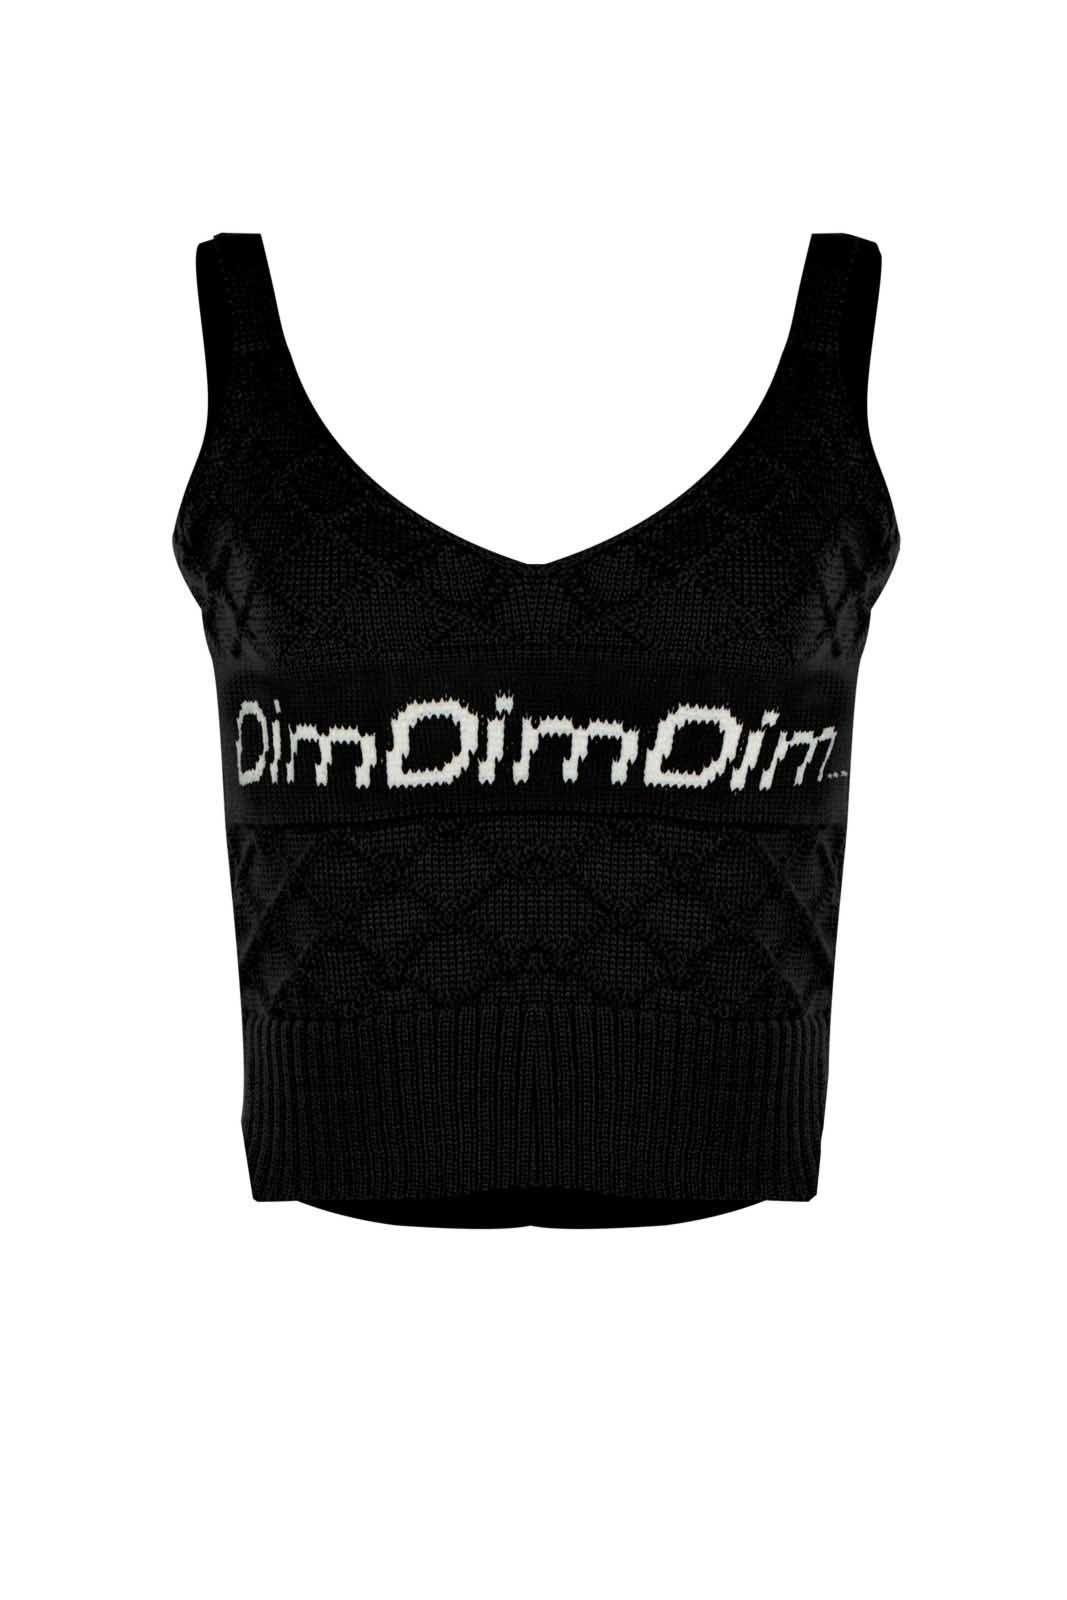 Top Outlet Dri Cropped Tricot Estampado Estampa DimDimDim Preto